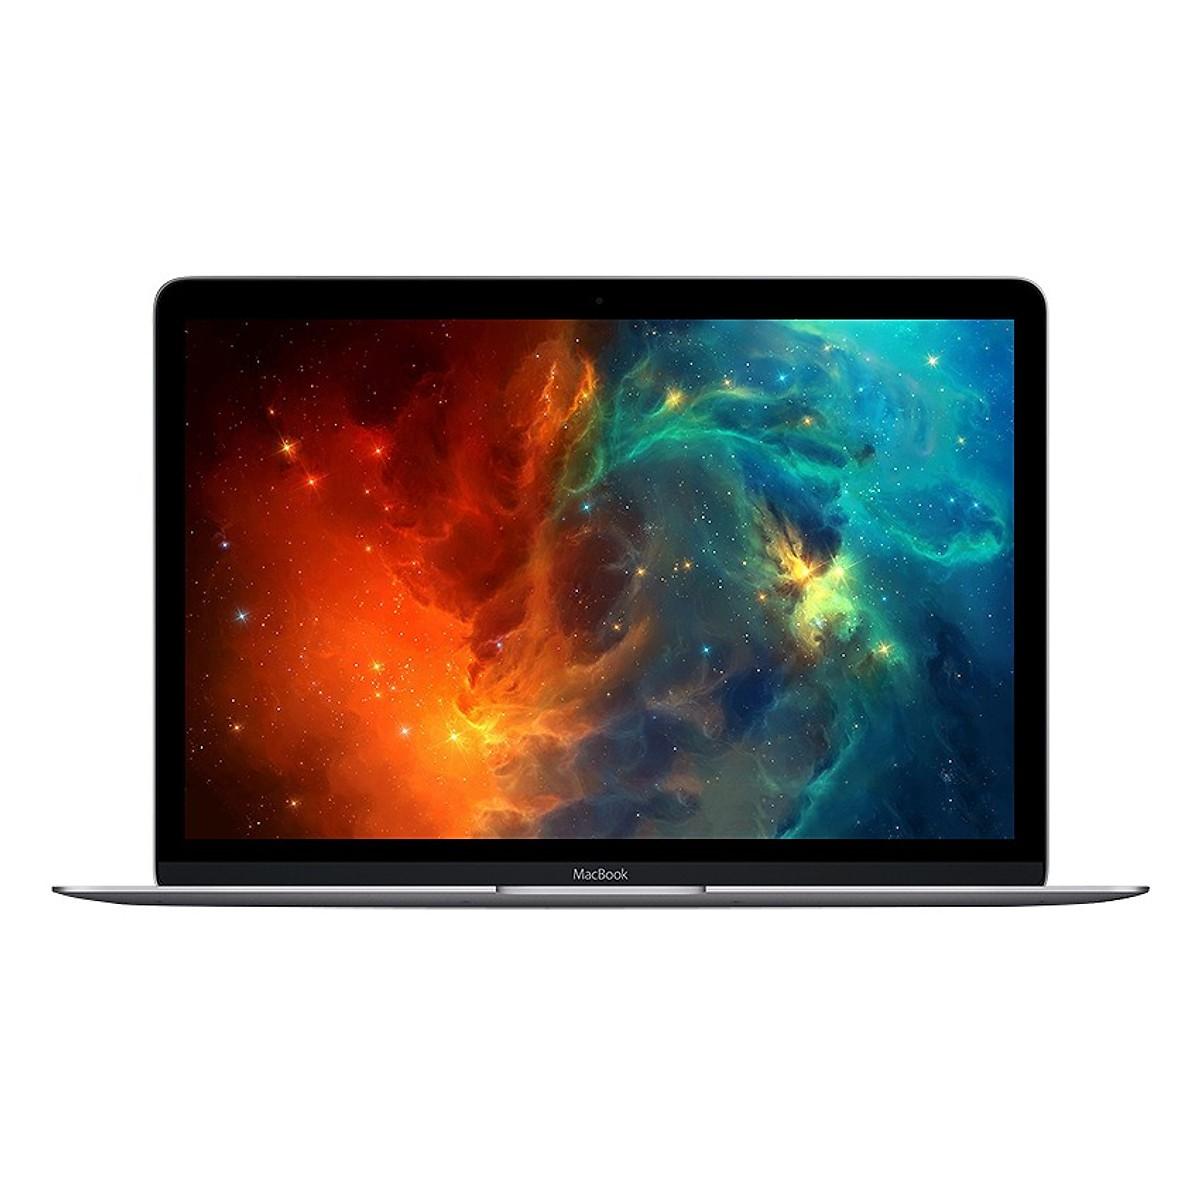 The New Macbook 12 Inch 2017-2018 Core M3 8GB 512GB ( Gold , Gray )